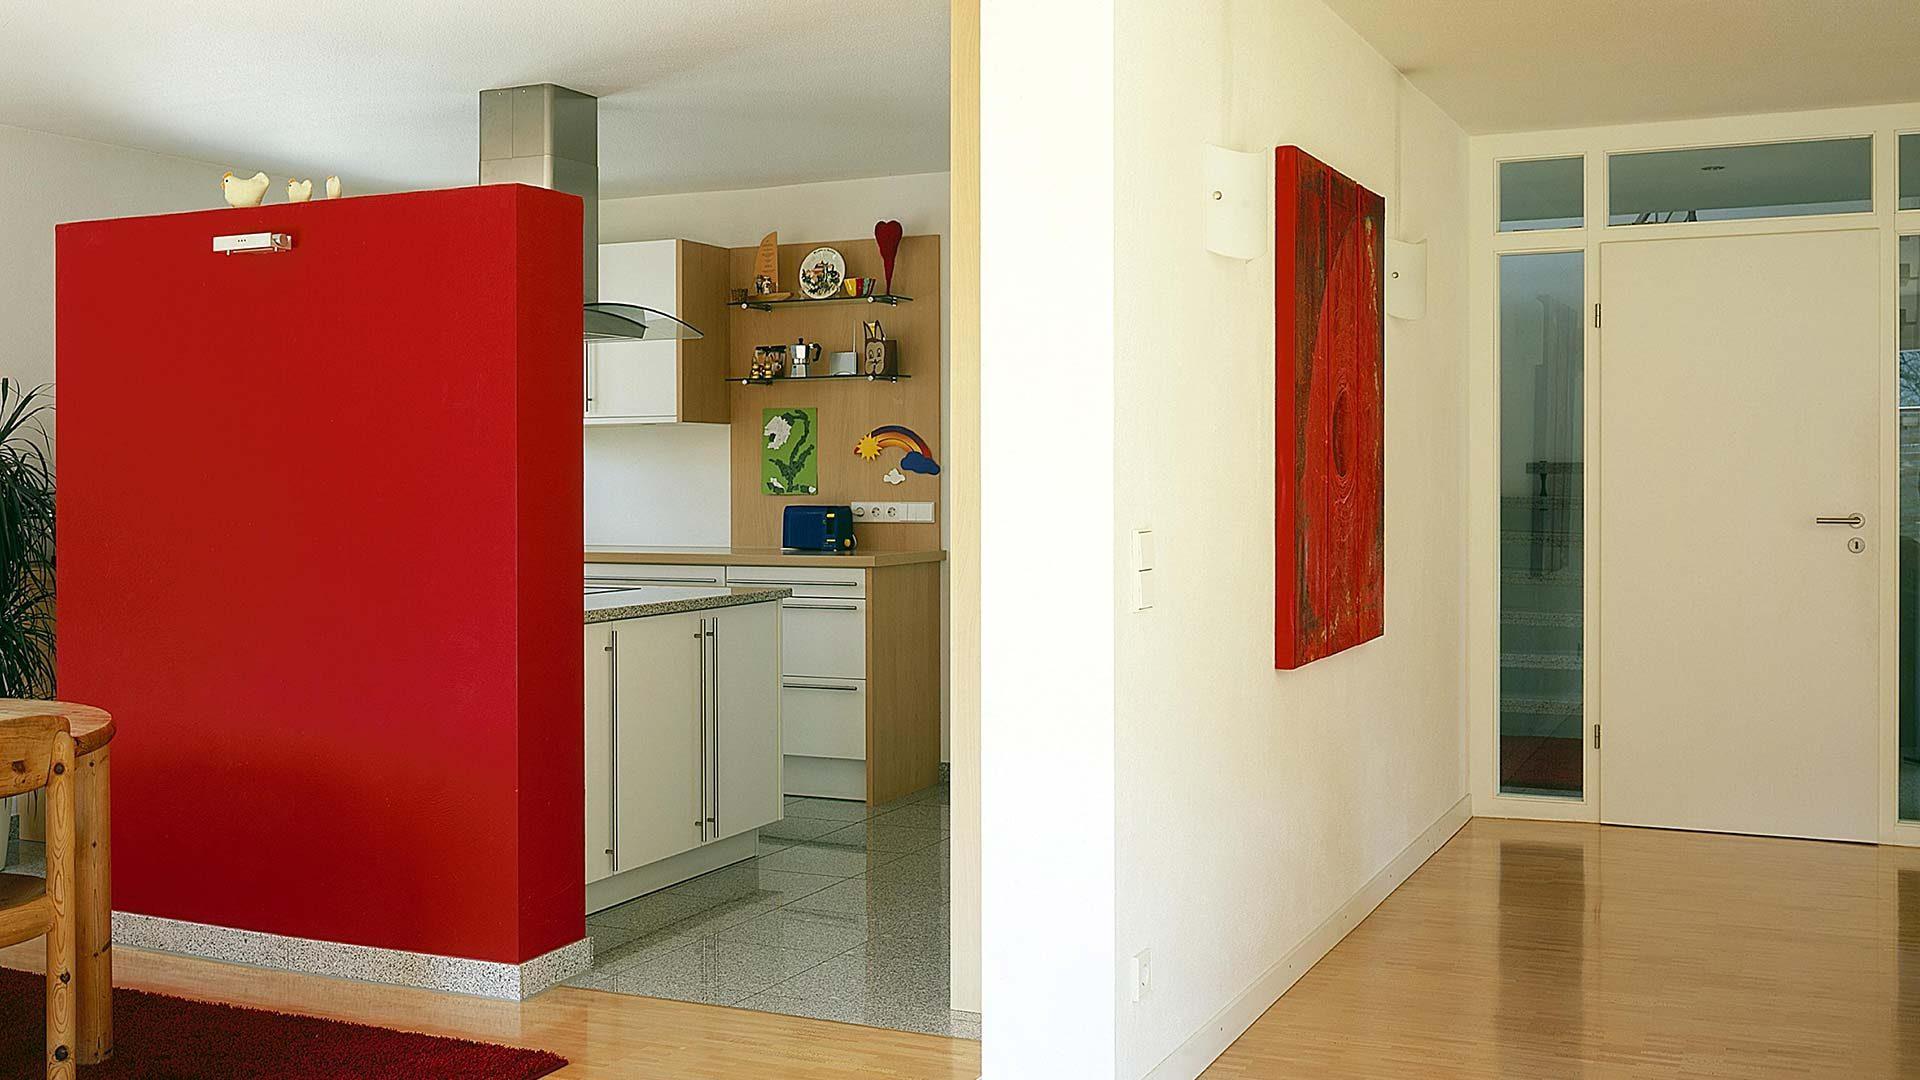 haus d in heilbronn werthaus heilbronn gmbh. Black Bedroom Furniture Sets. Home Design Ideas